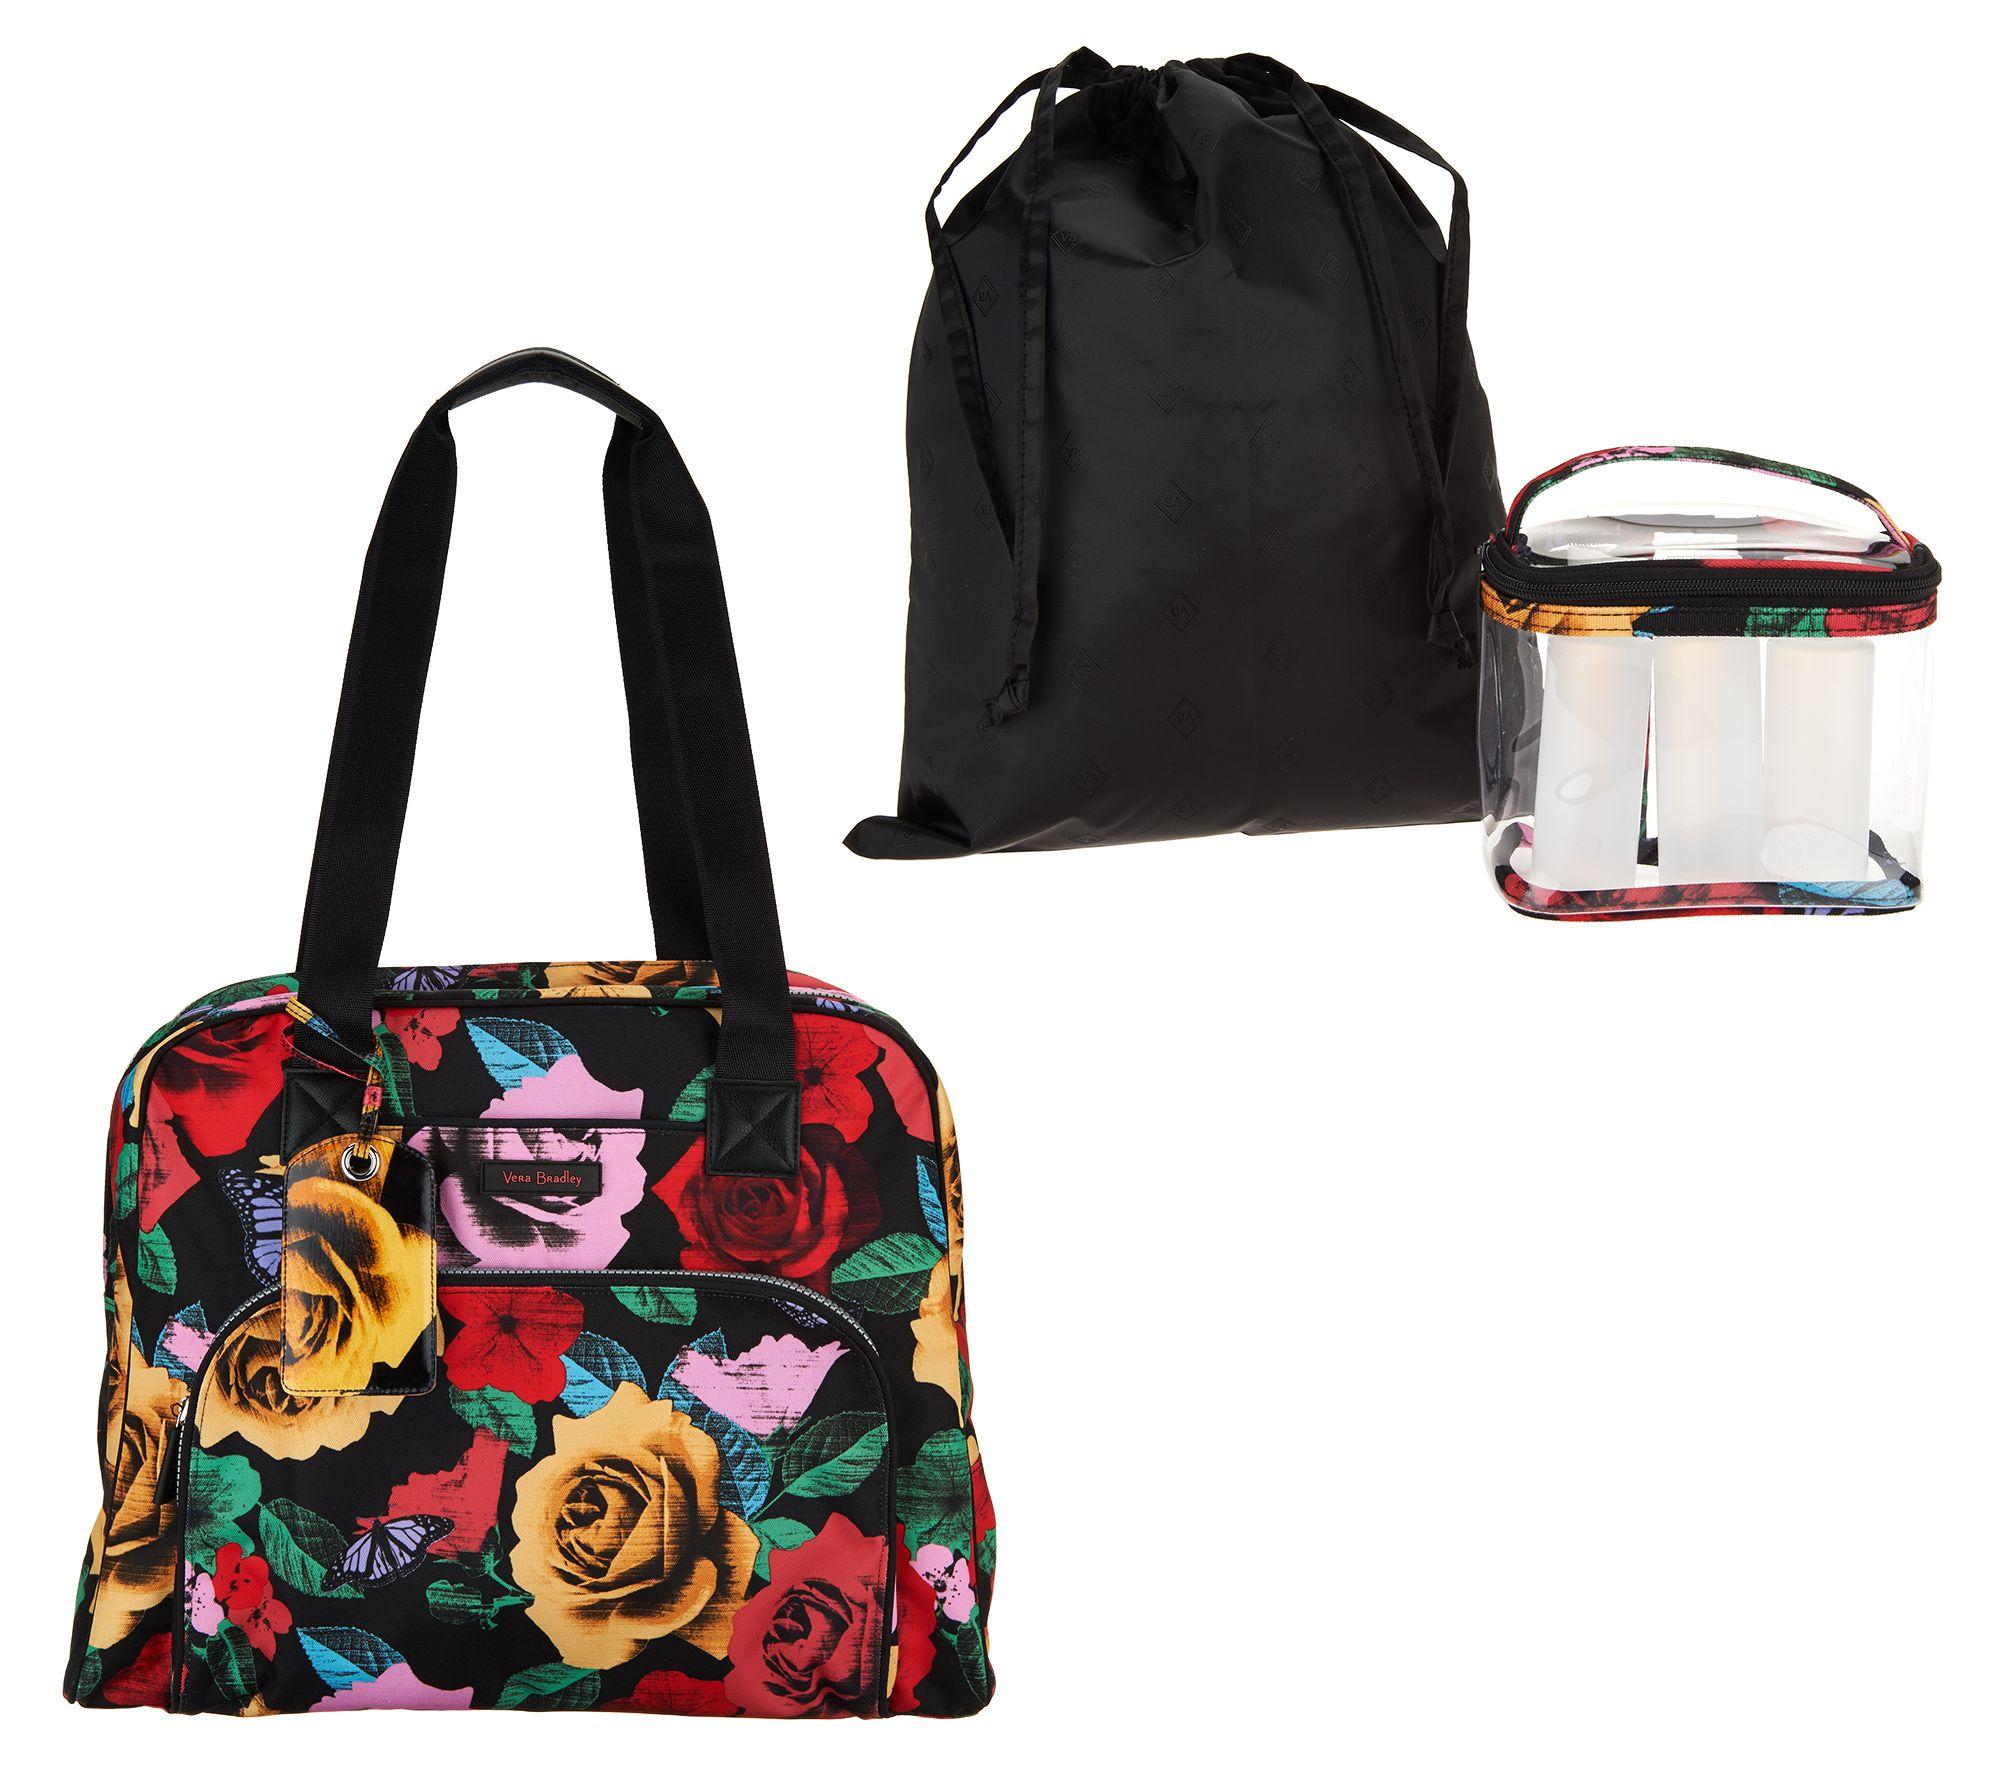 Vera Bradley Travel Bag w  3-1-1 Cosmetic Bag - Page 1 — QVC.com e14e6f561c3c8